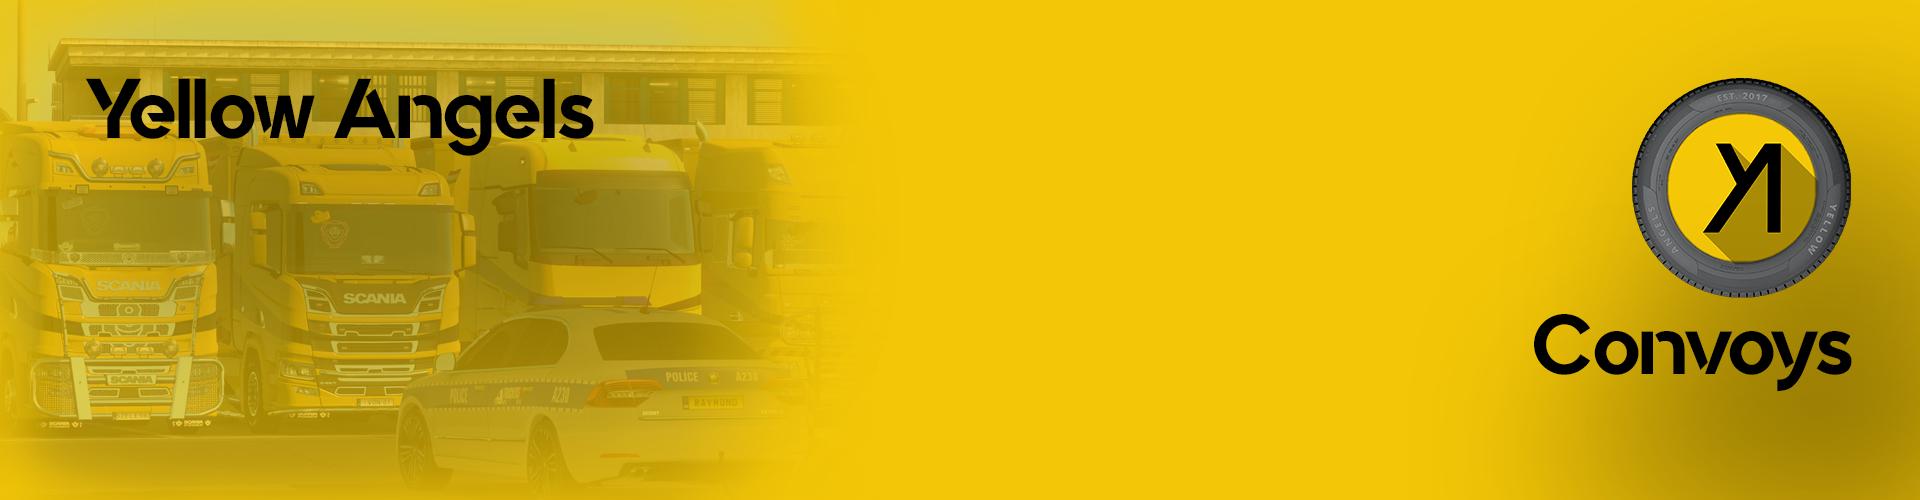 Yellow Angels Novemberi konvoj